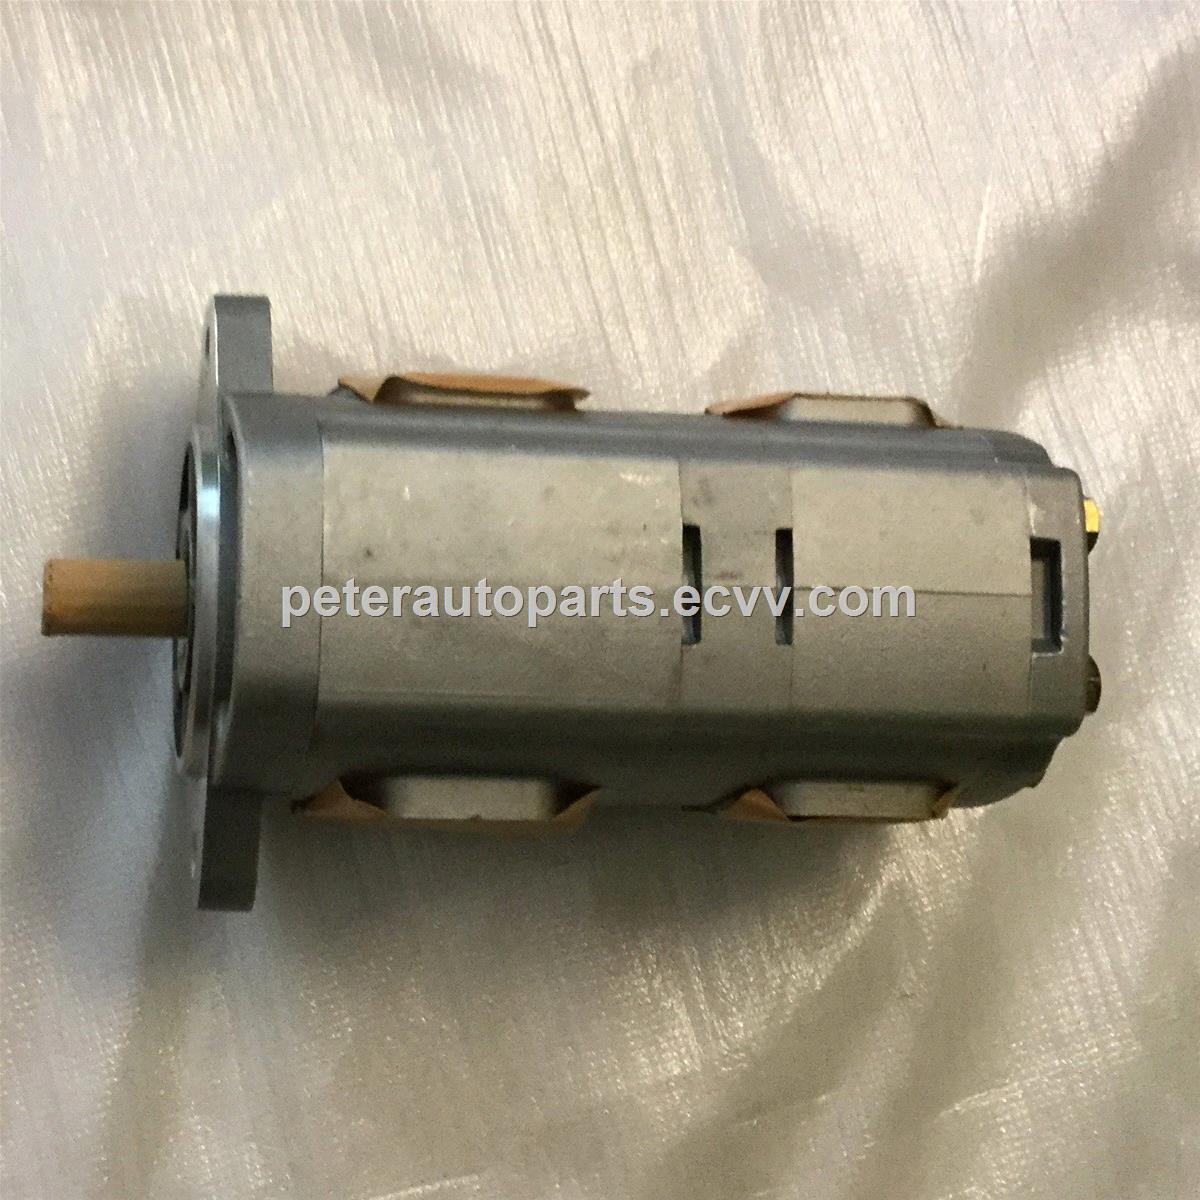 Hydraulic pump 0960201643 2P310550CK GD505A3